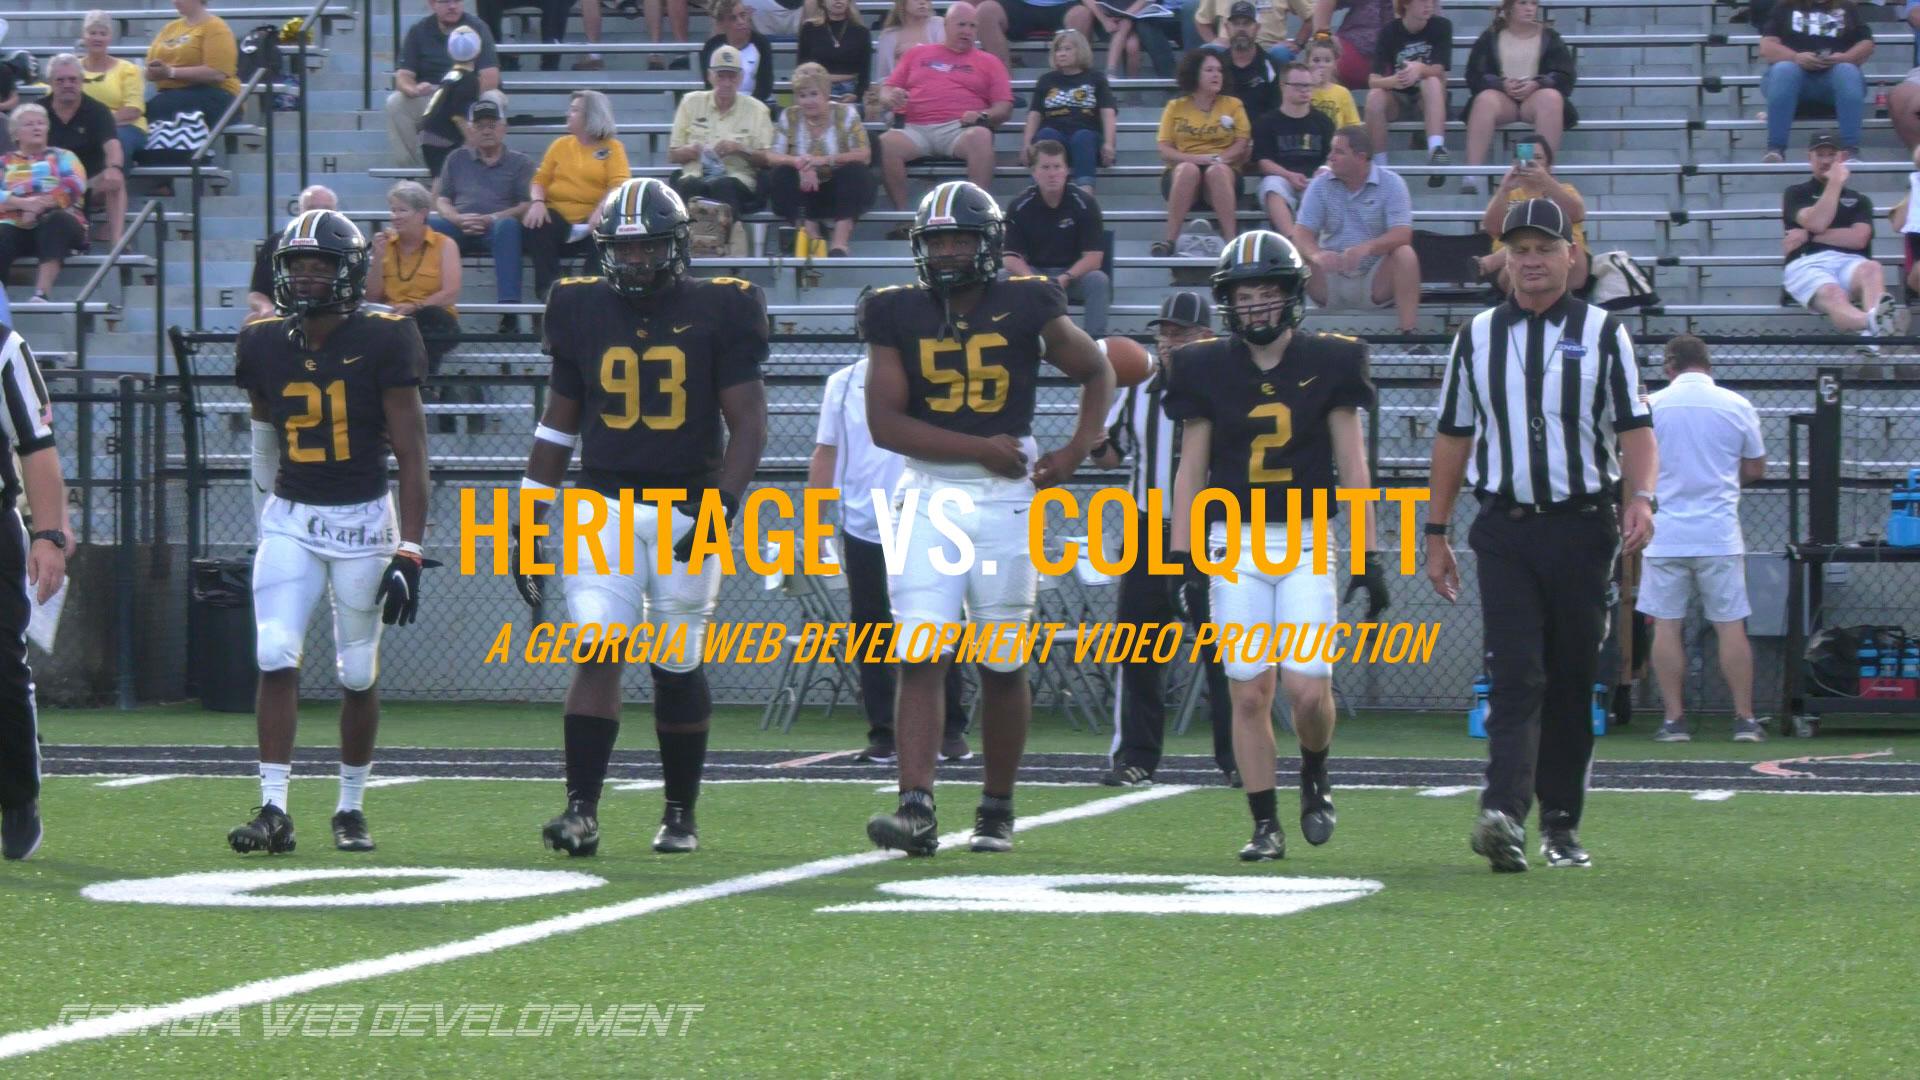 heritage-vs-colquitt-2021